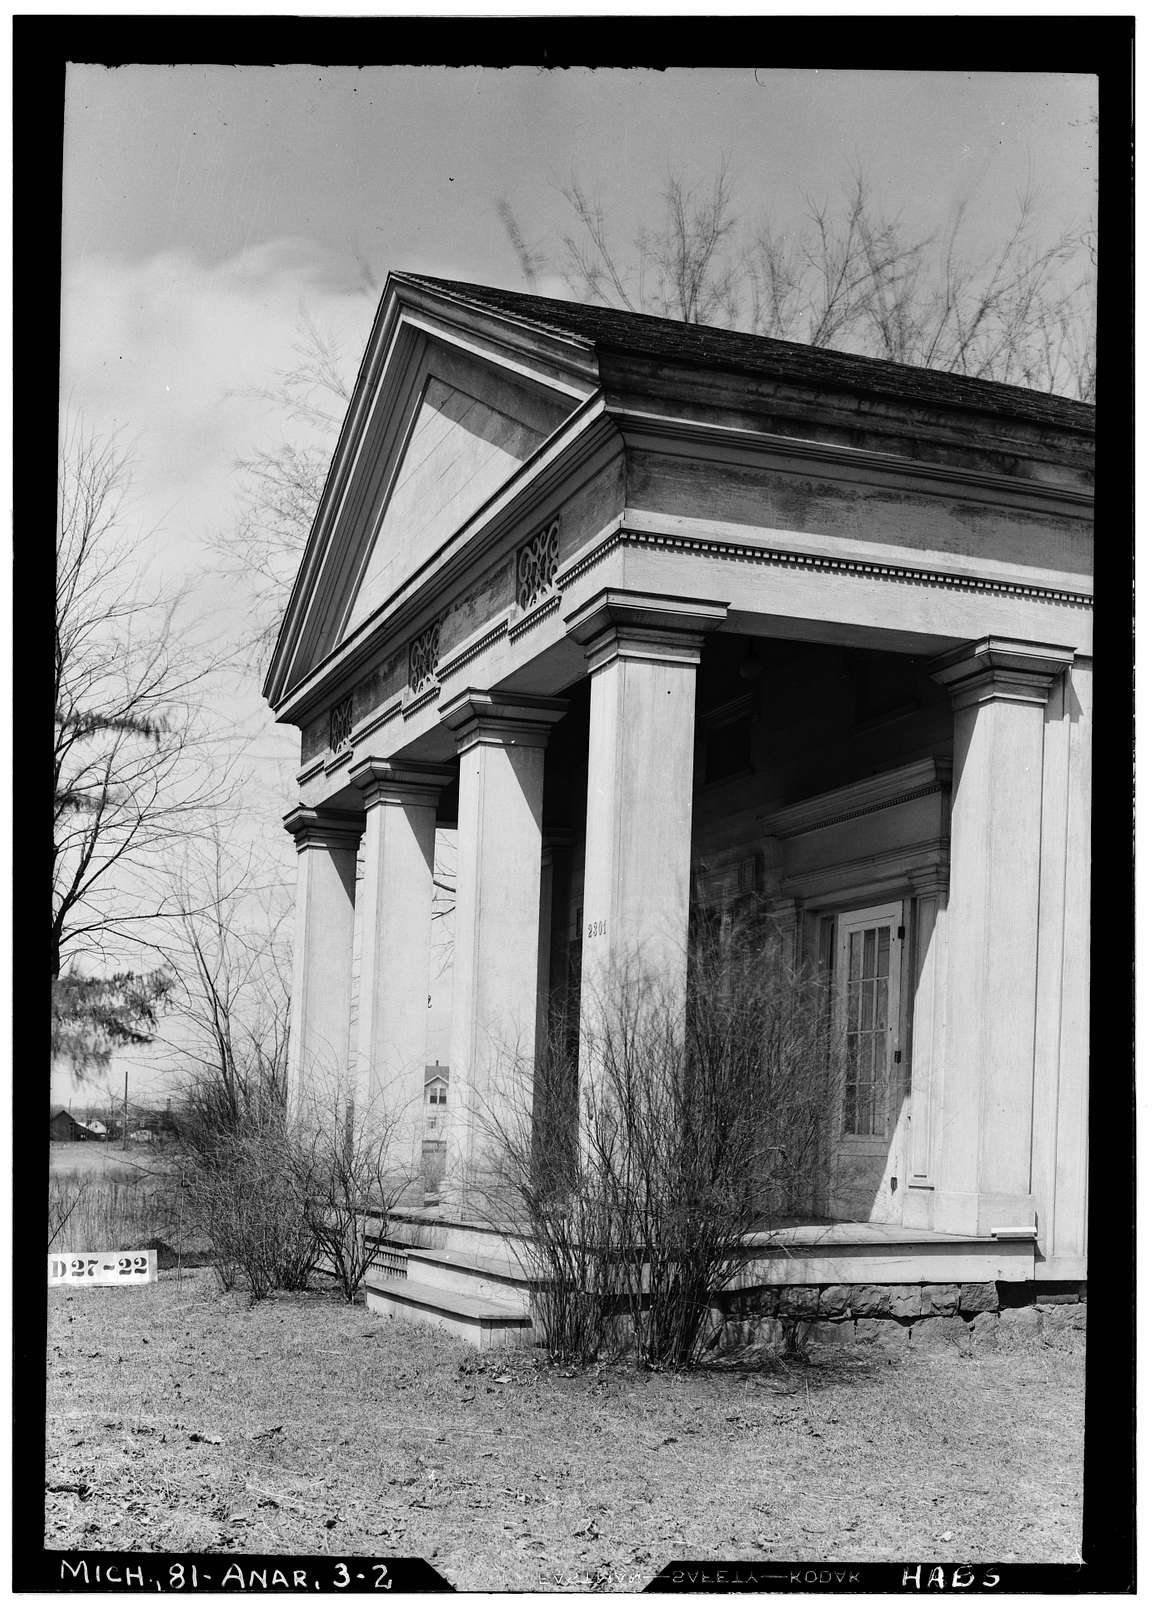 Anderson House, 2301 Packard Road, Ann Arbor, Washtenaw County, MI